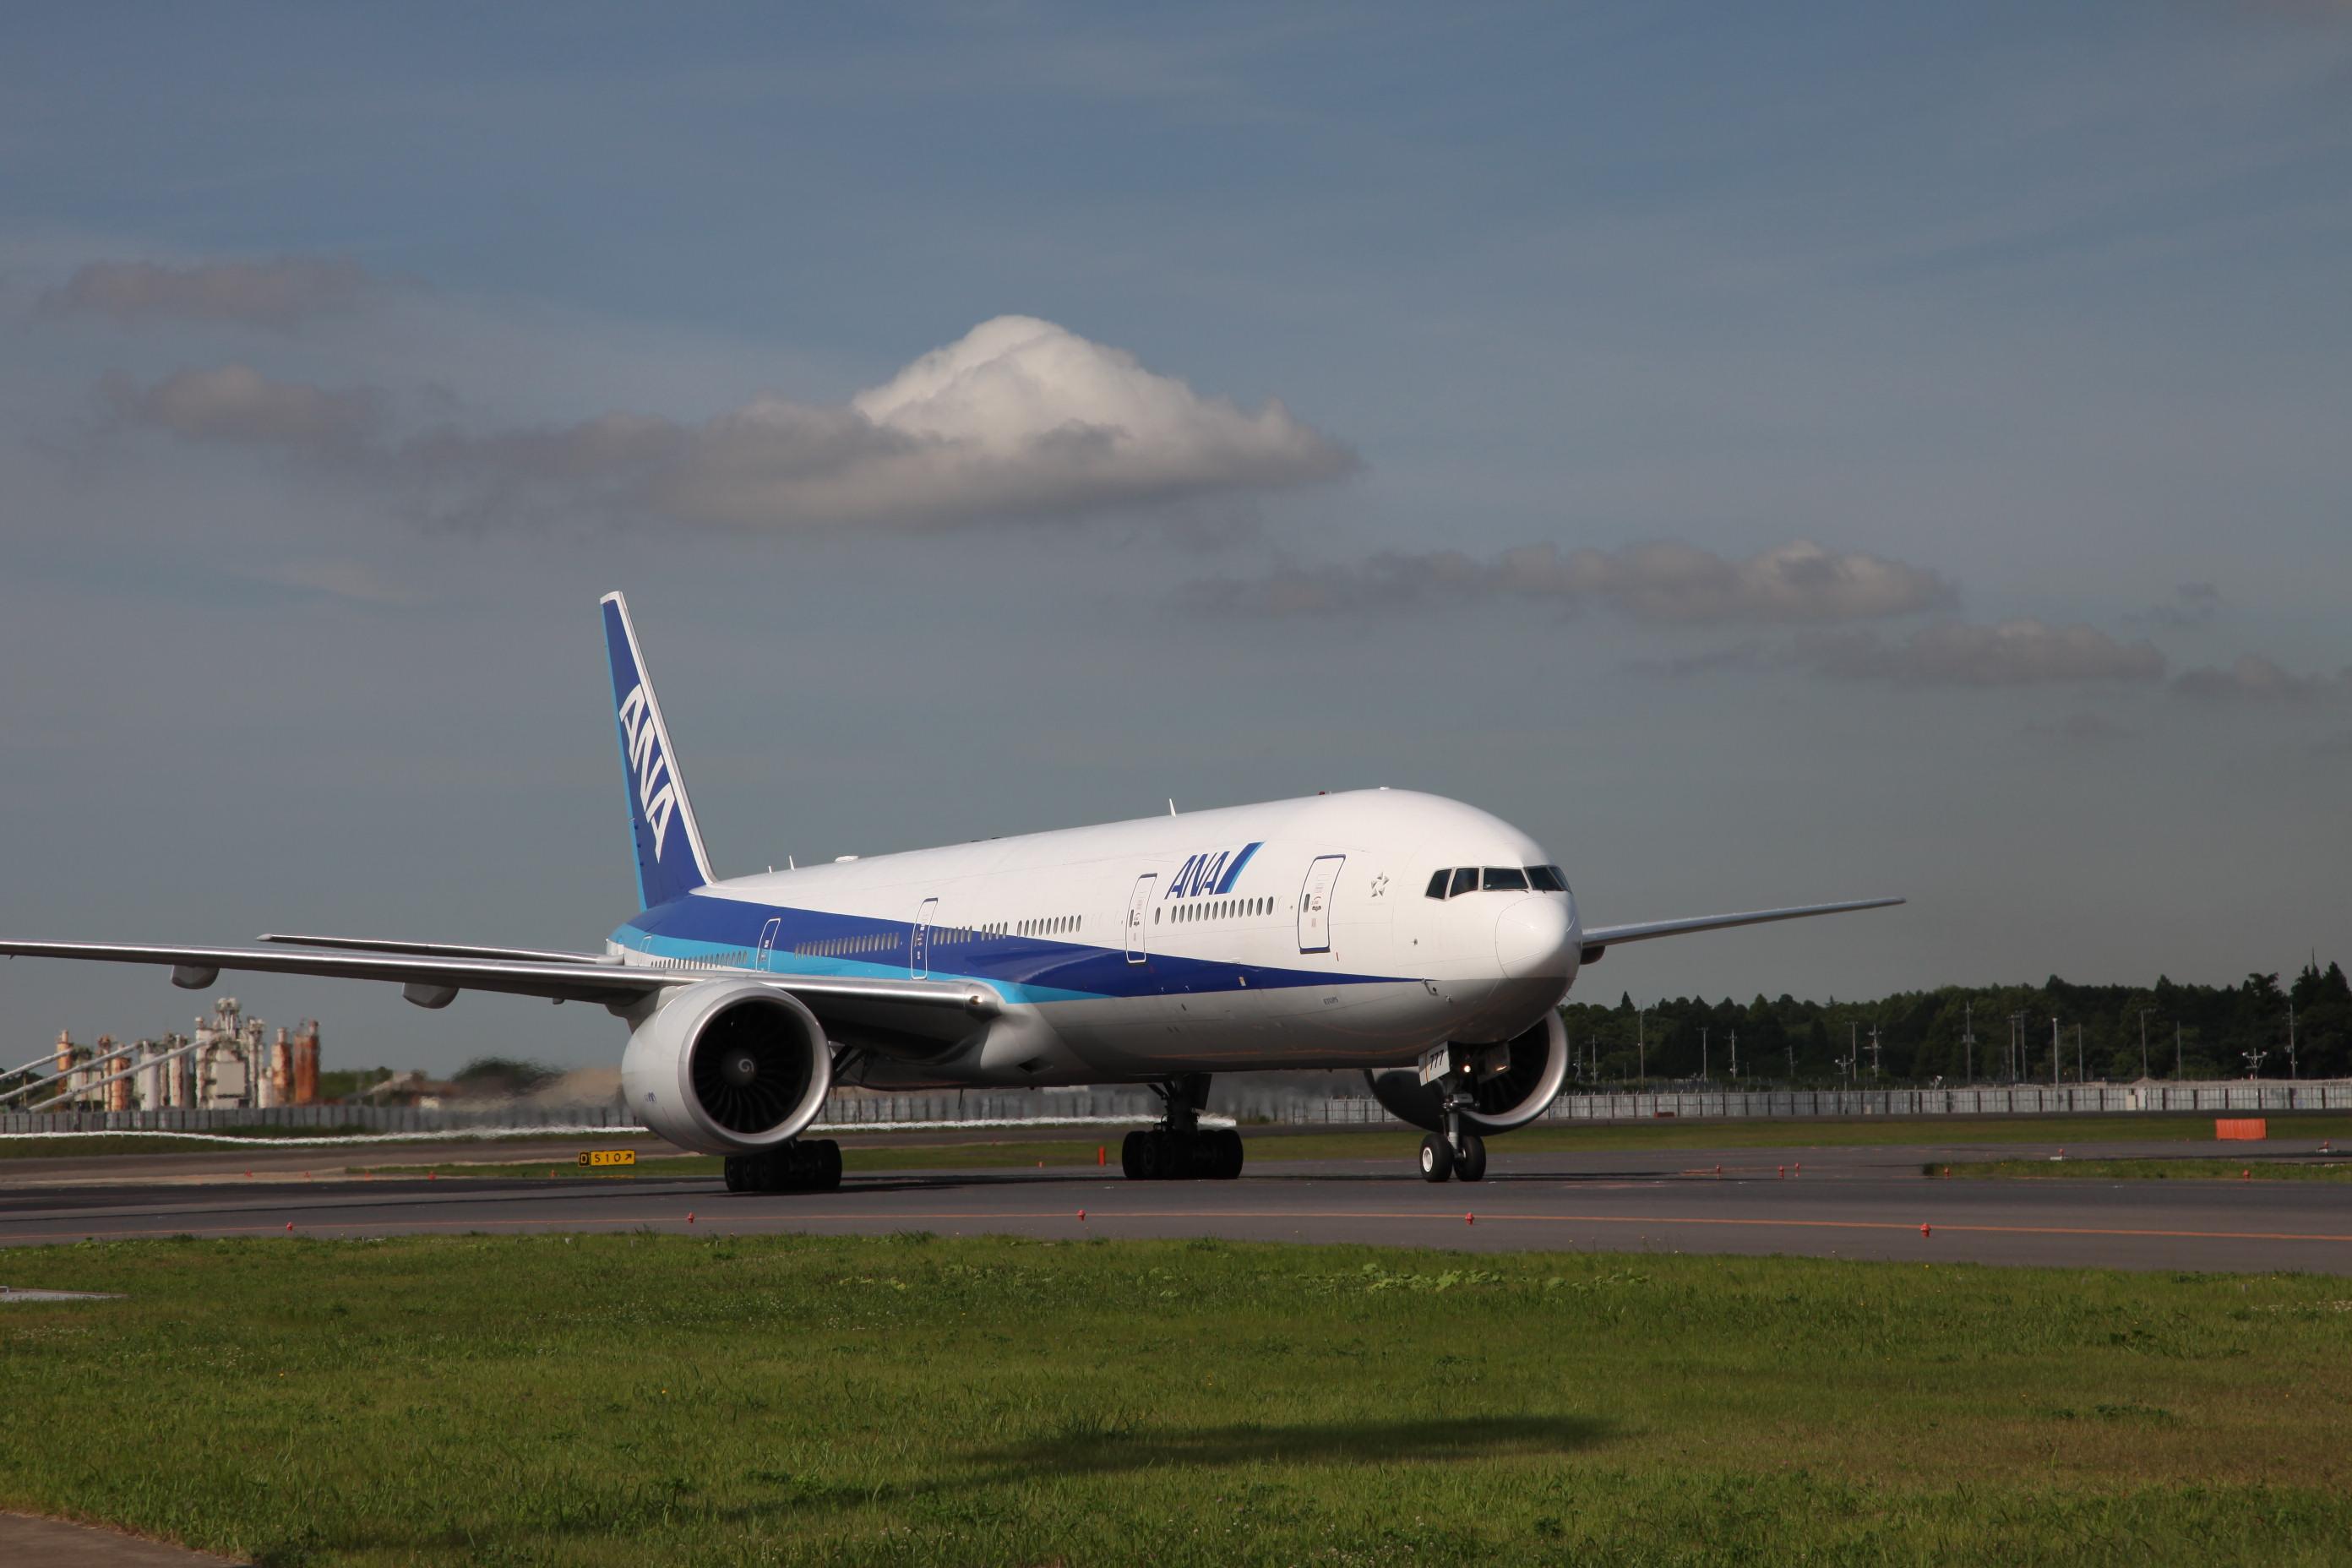 ANA、羽田/沖縄線で初の深夜便「ギャラクシーフライト」設定、夏休み期間の増便で